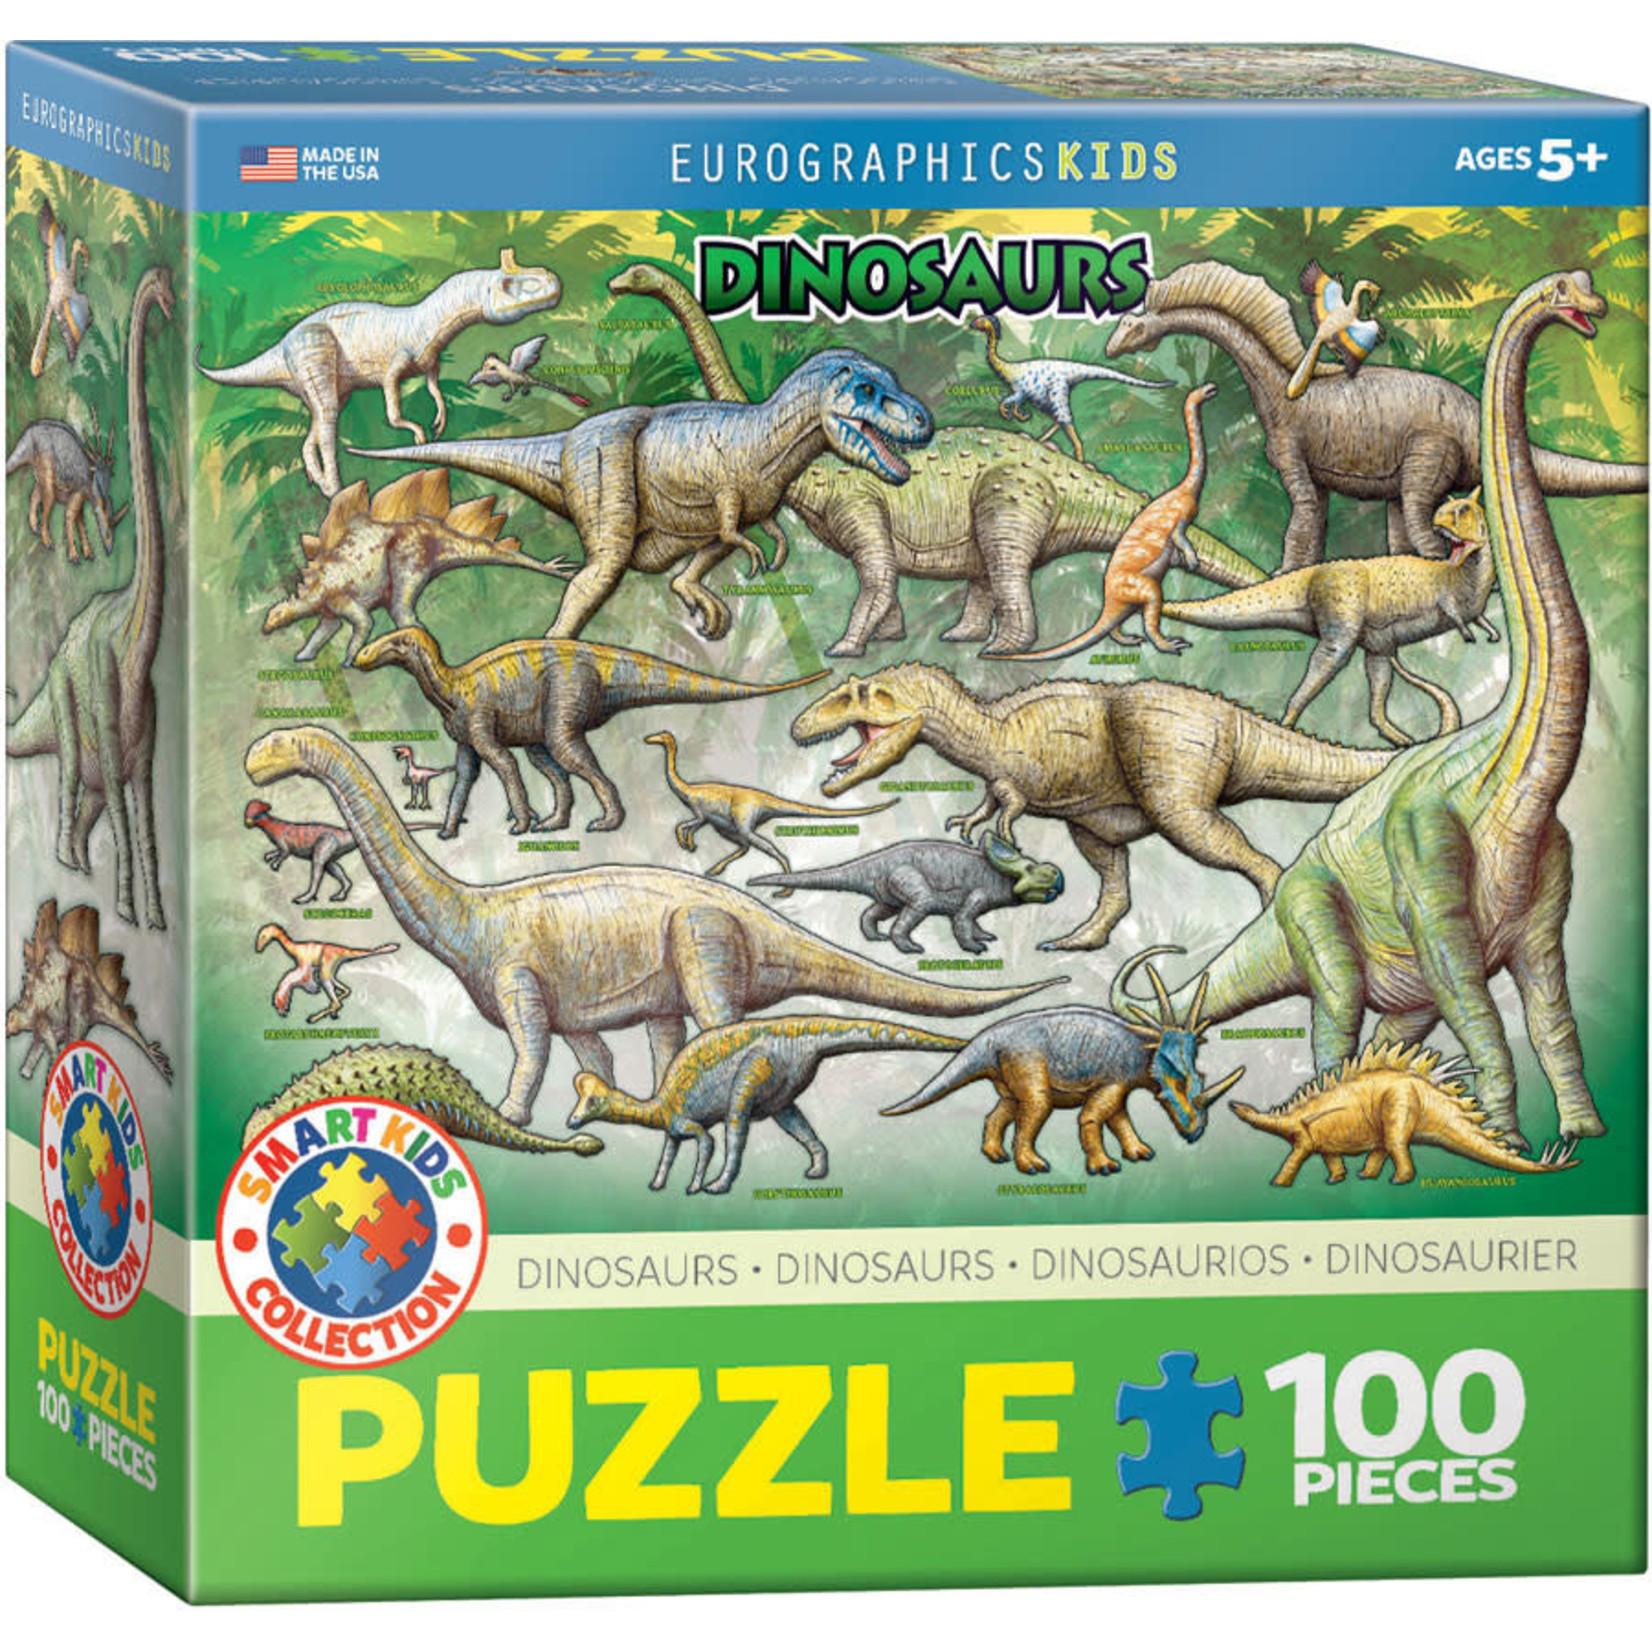 Eurographics Eurographics Puzzle: Dinosaurs - 100pc